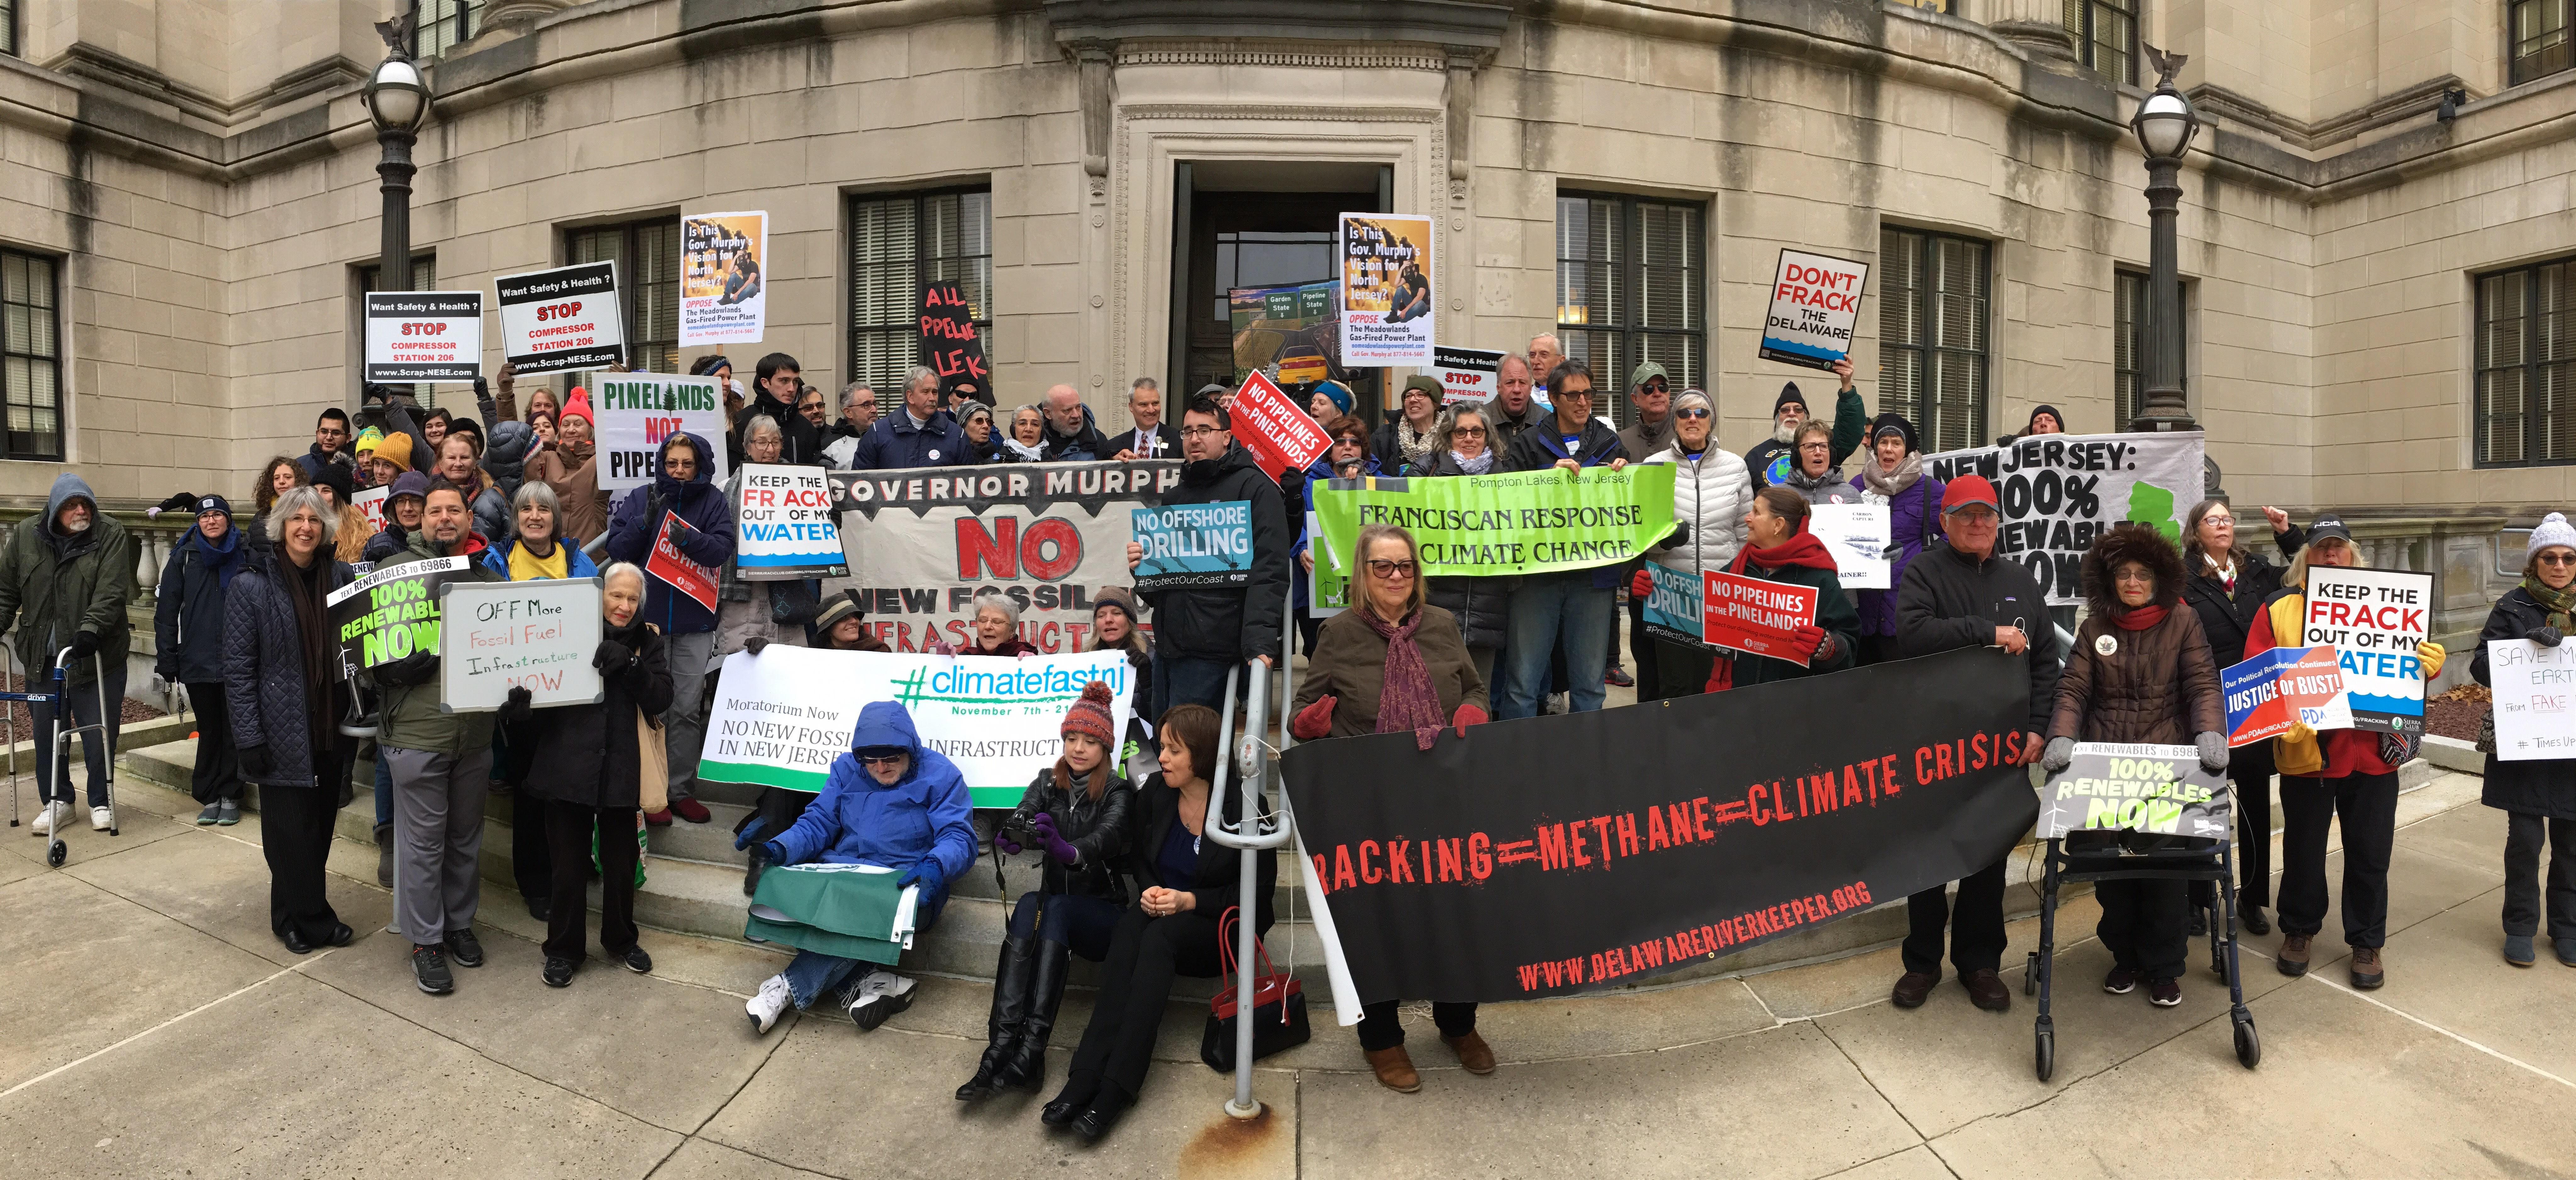 NJ_EmpowerNJ_Campaign Launch_Trenton_Coalition_Photo By David Pringle